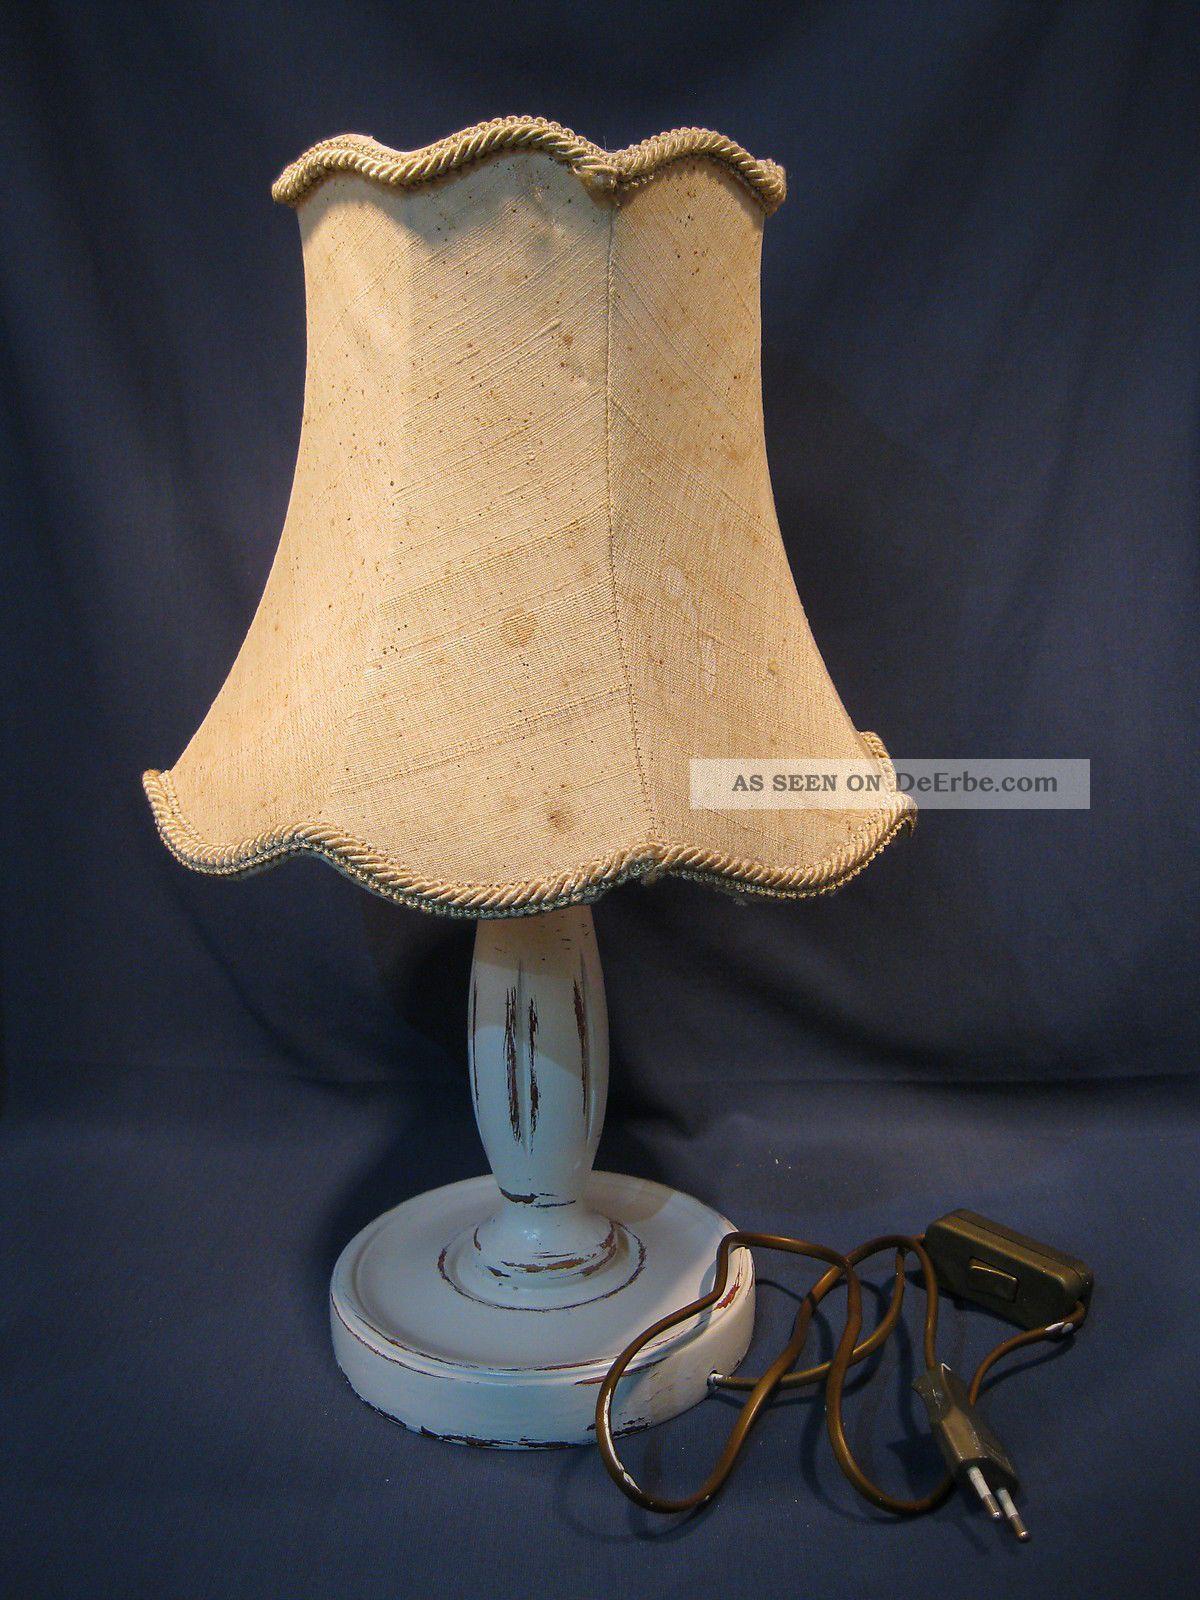 alte tischlampe mit holzfu 42cm hoch shabby stil. Black Bedroom Furniture Sets. Home Design Ideas